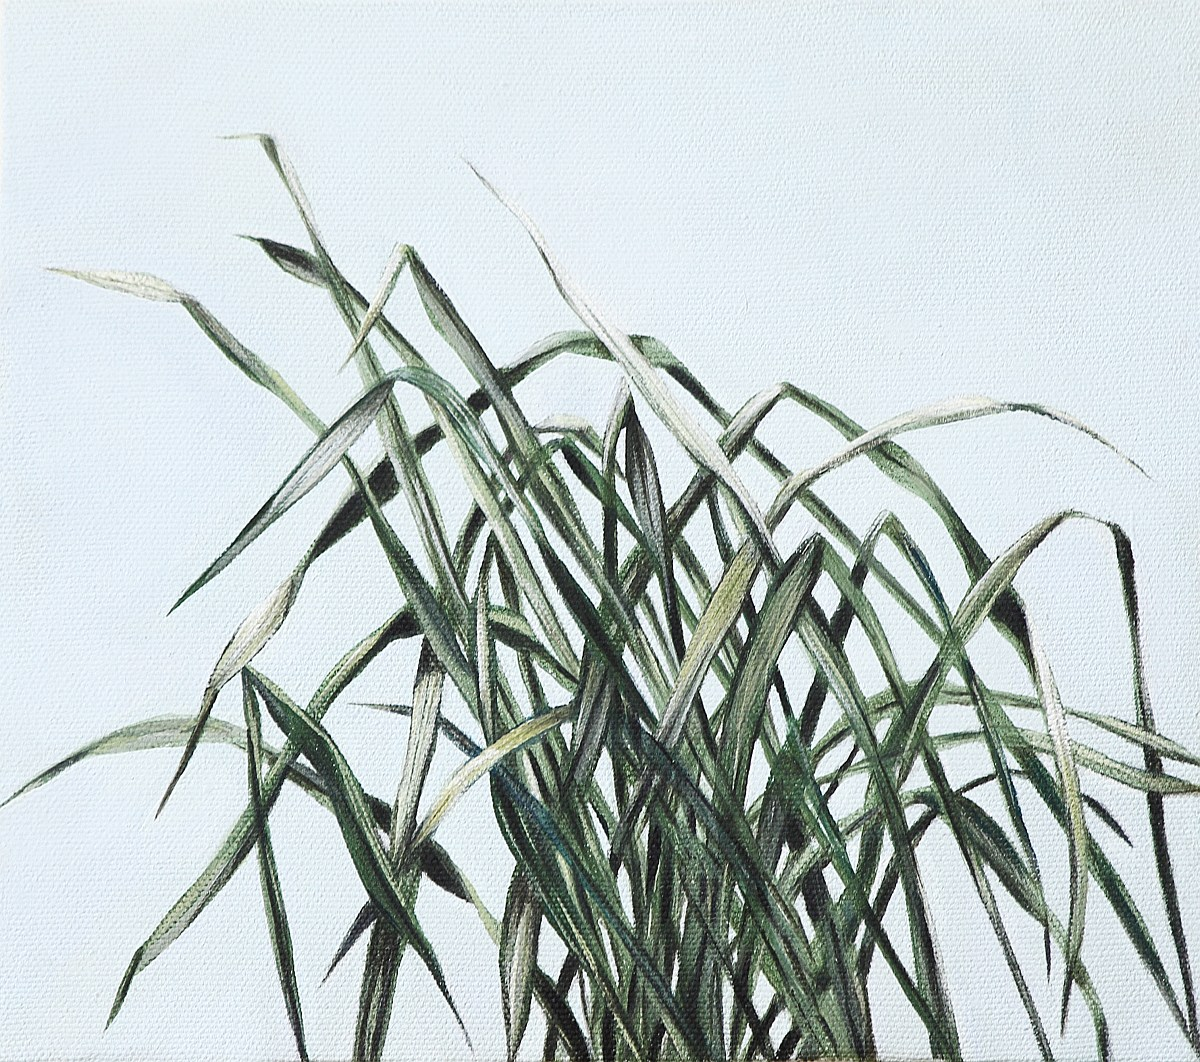 Vegetationszonen II, Michaela Kern